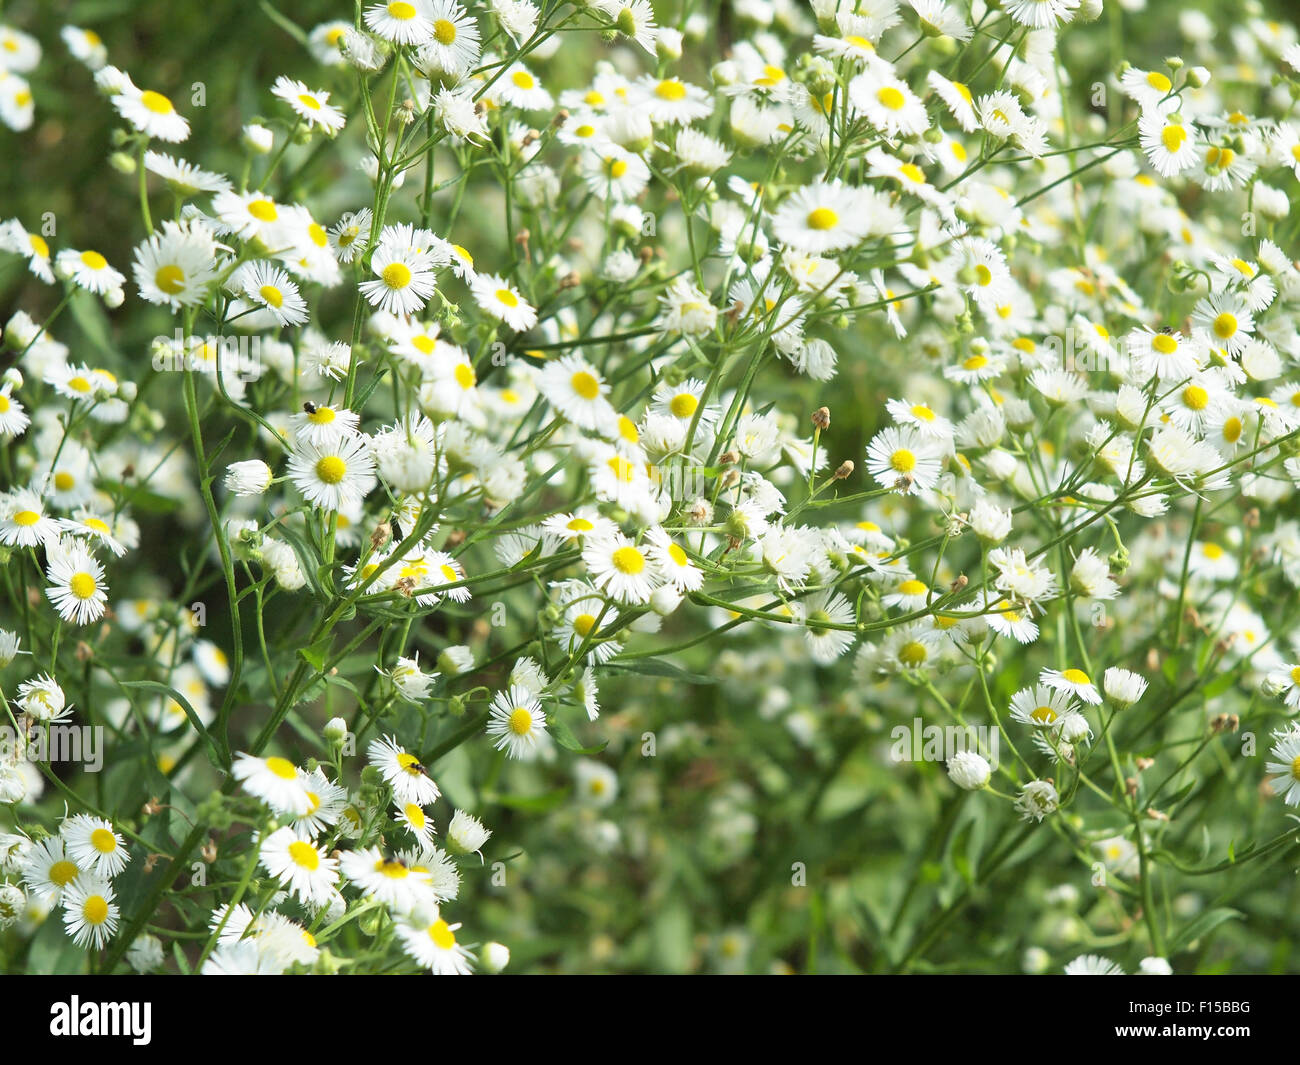 Small White Daisy Flowers Stock Photos Small White Daisy Flowers